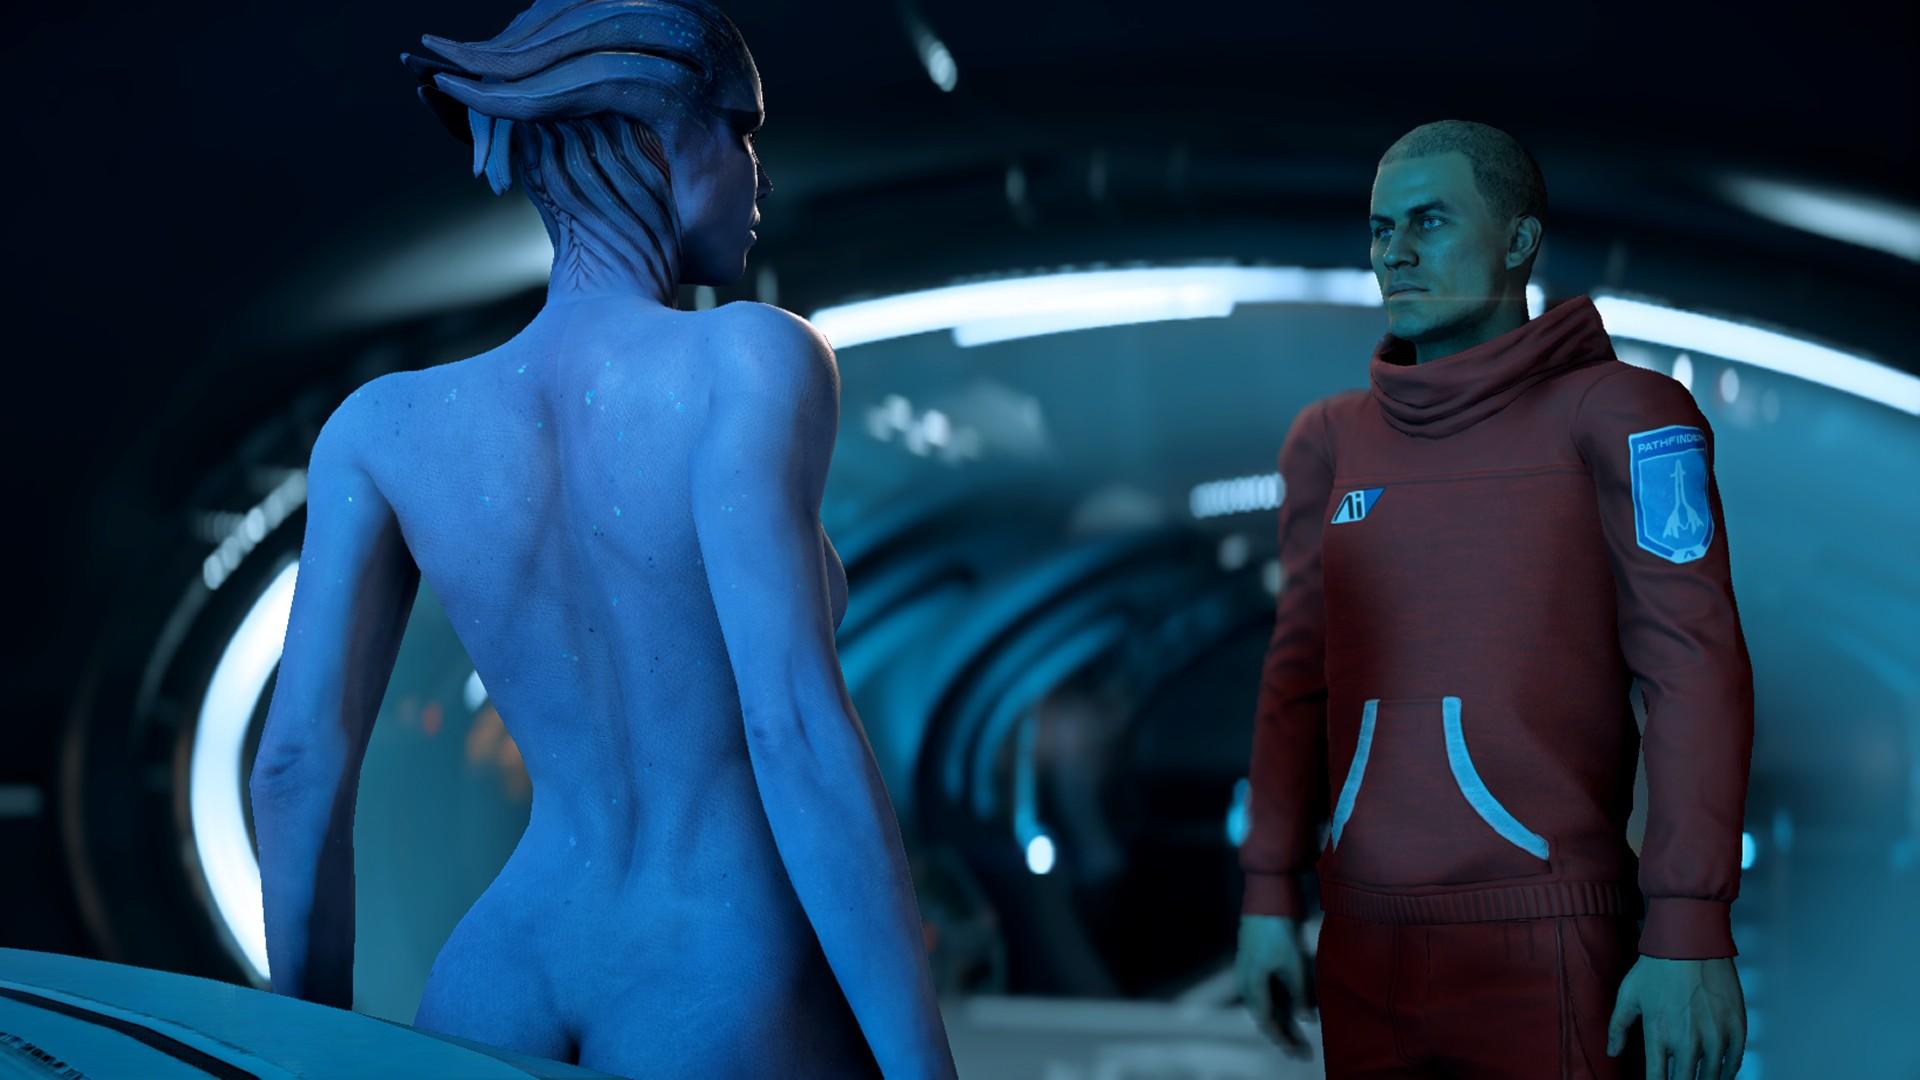 Mass Effect Andromeda Screenshot 2018.03.04 - 11.45.25.28.jpg - Mass Effect: Andromeda